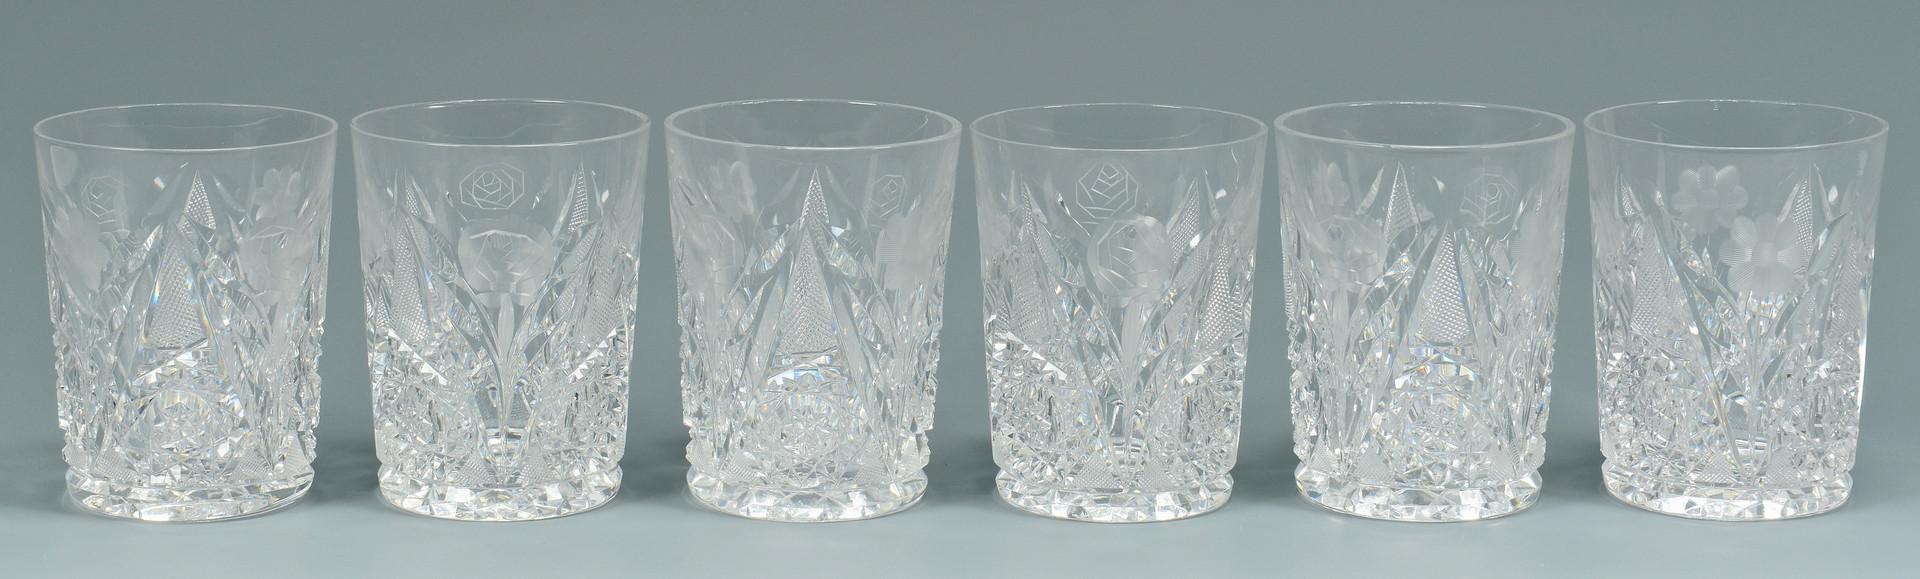 Lot 554: 11 Cut Glass items inc. Bridgeton Rose